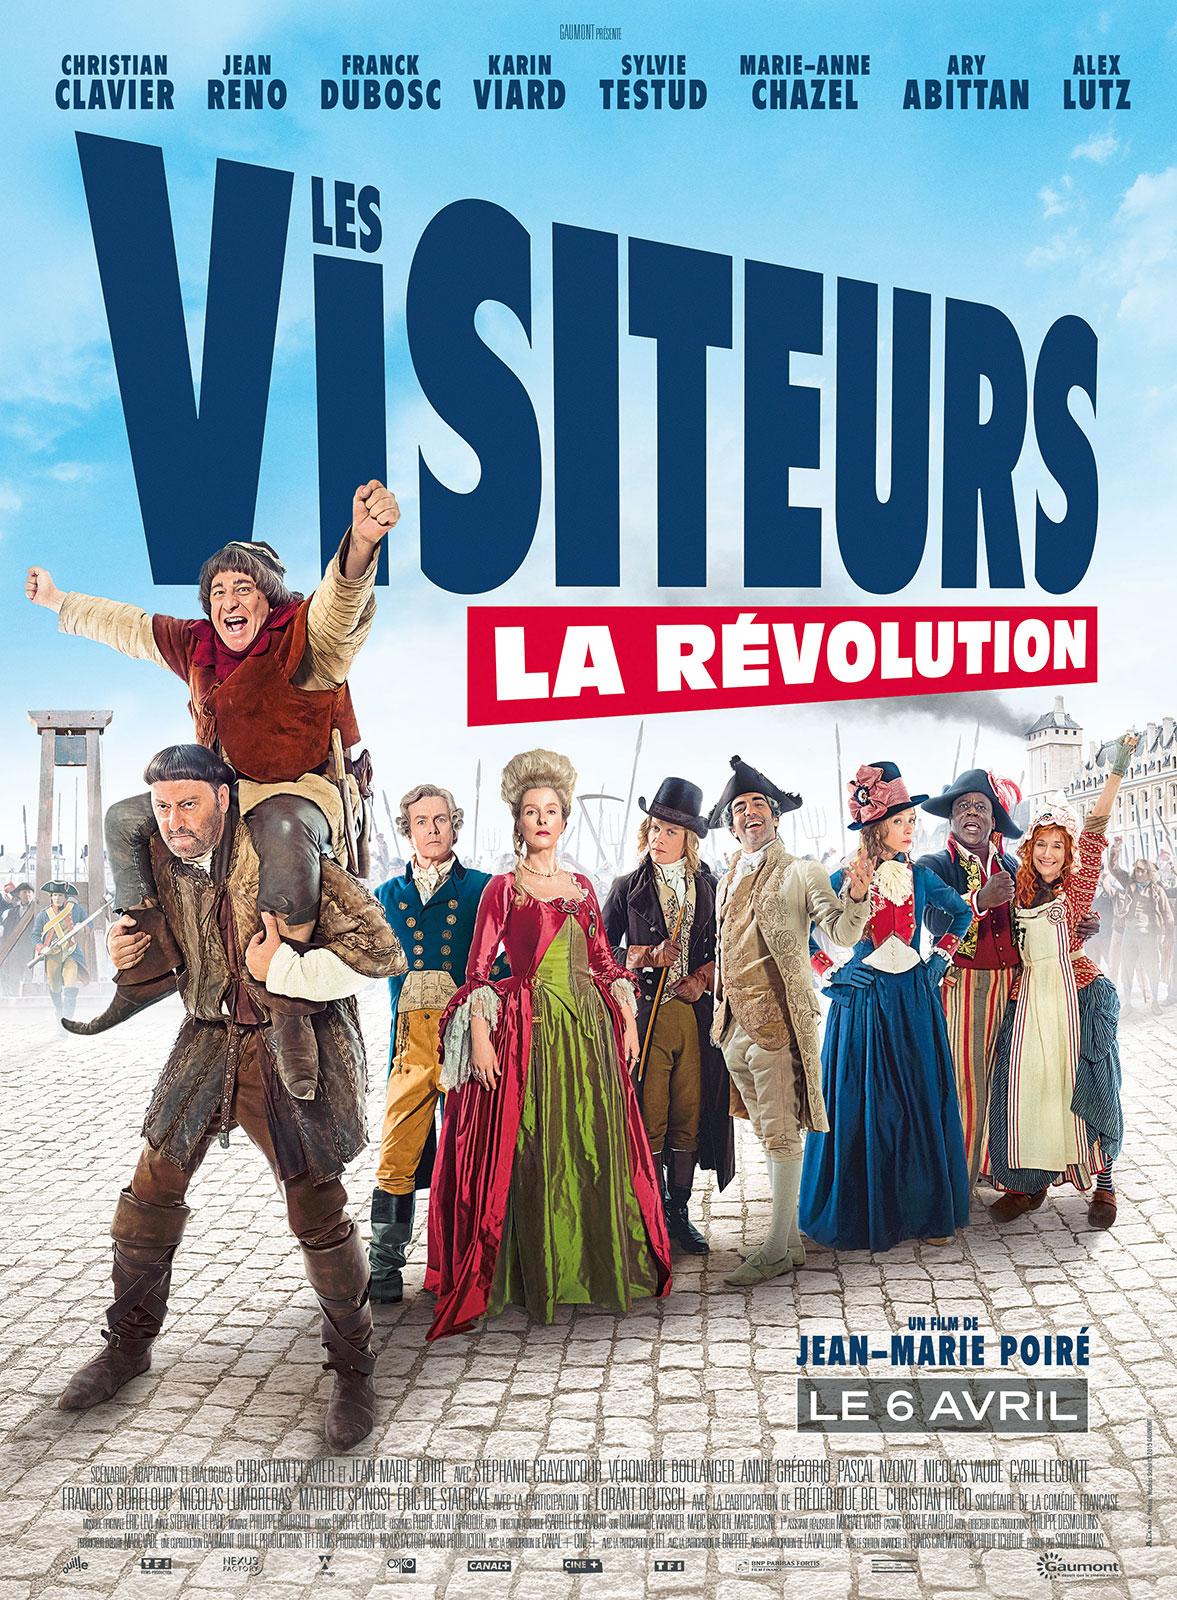 les-visiteurs-la-revolution_poster_goldposter_com_1.jpg